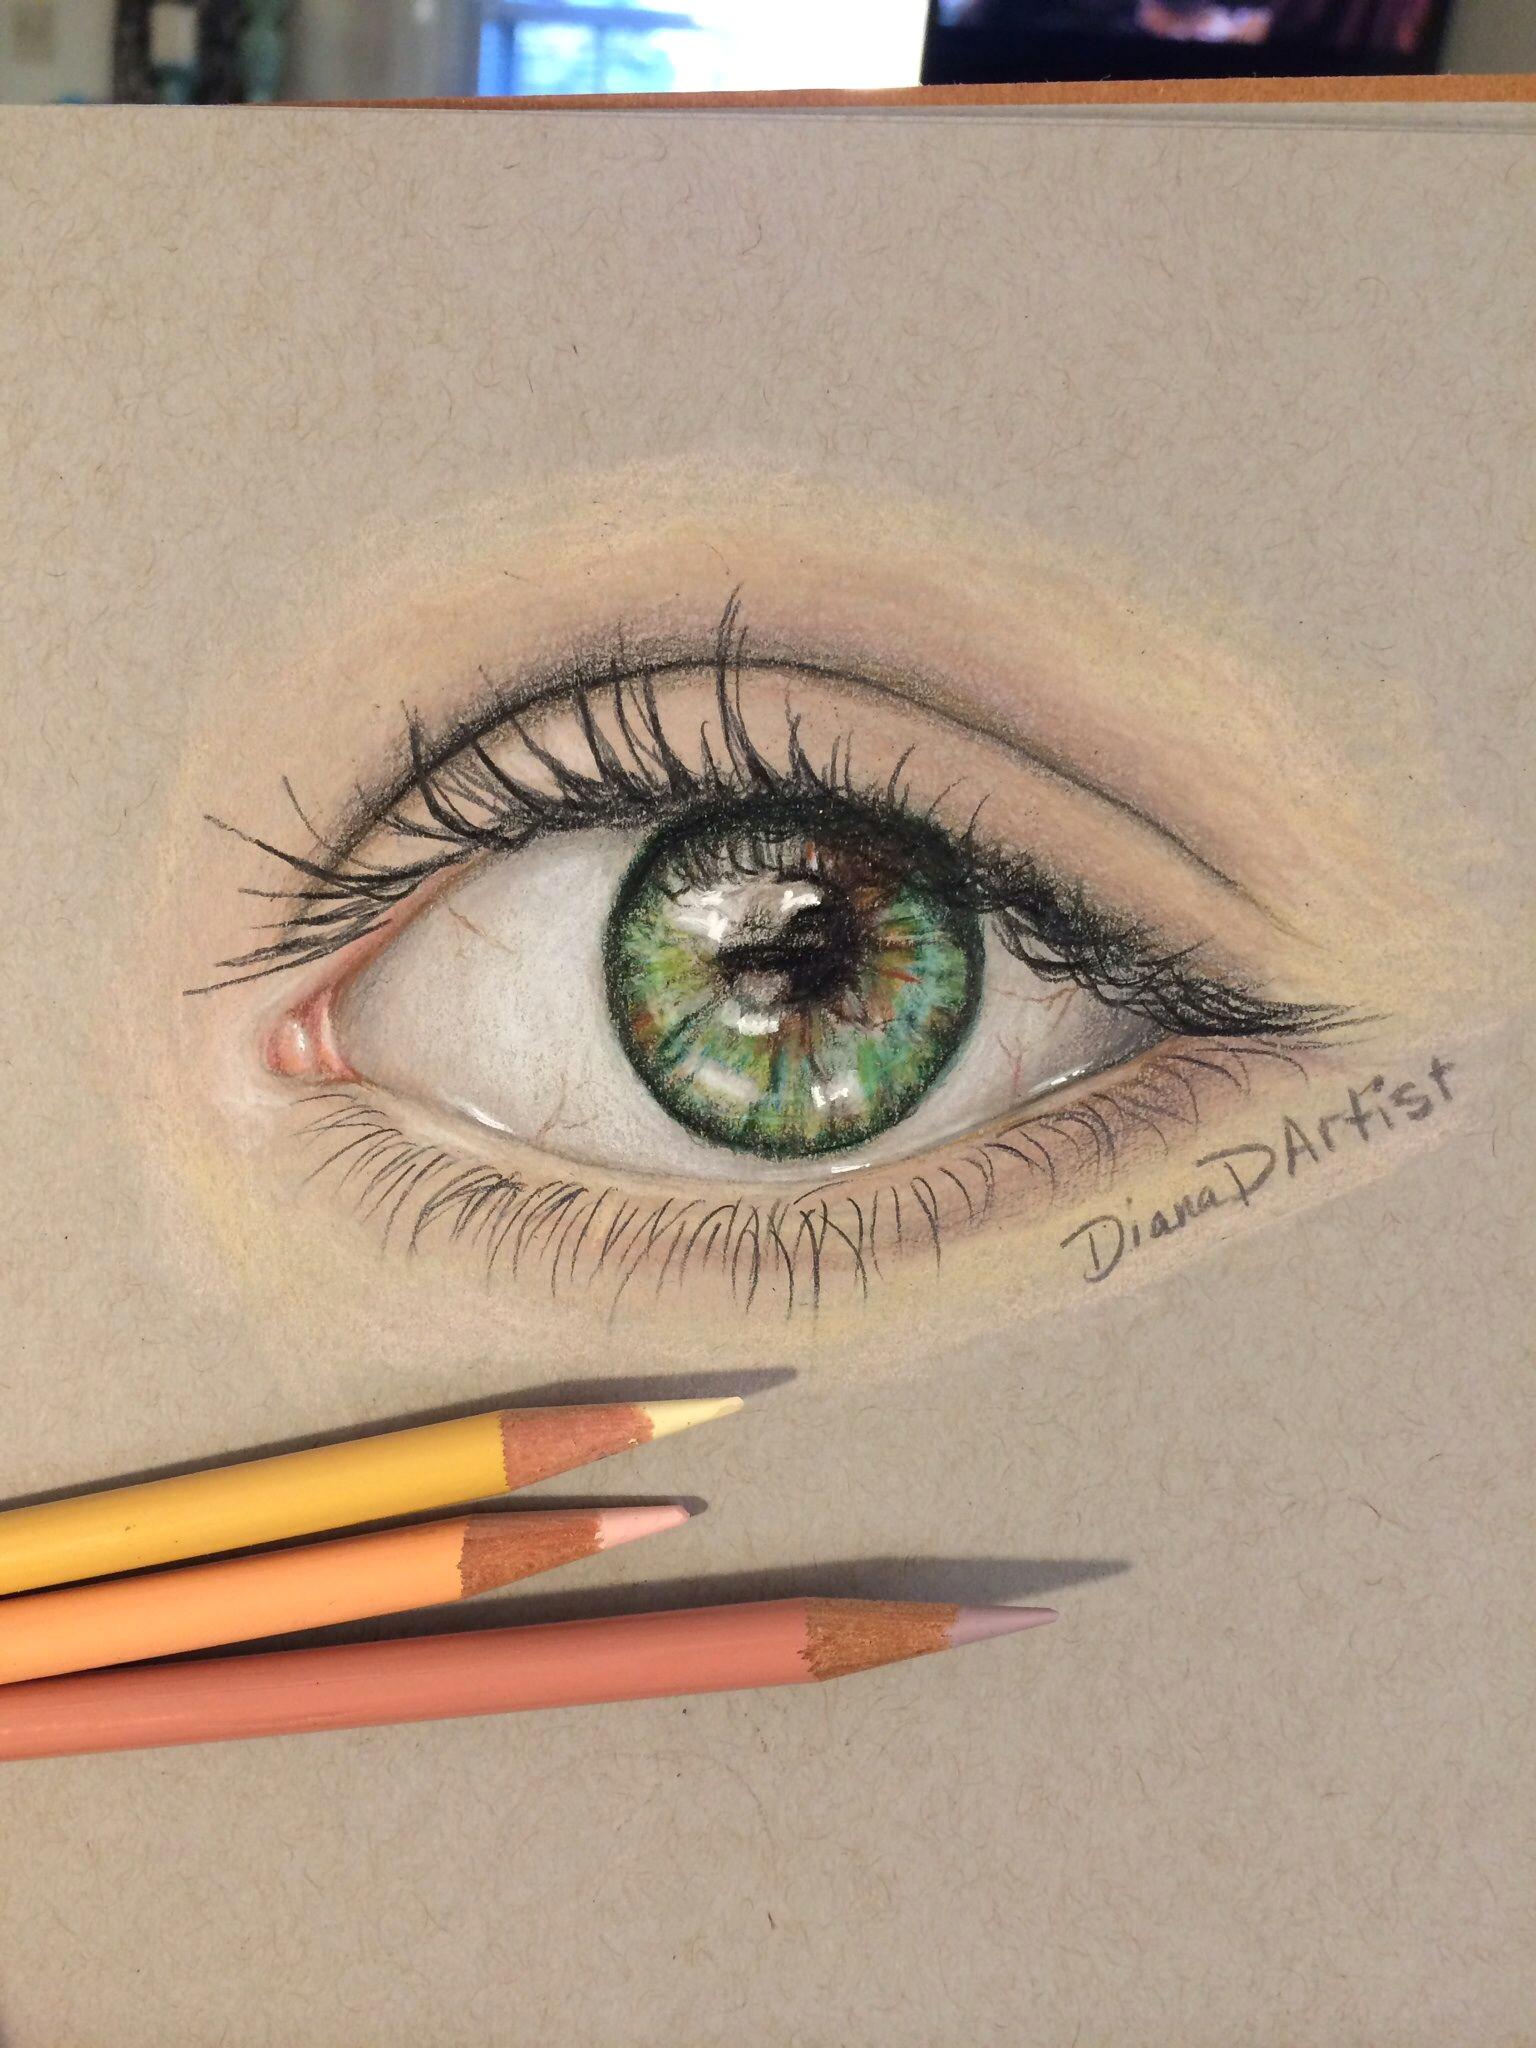 colored pencil eye study www overcomersart com dianadartist instagram